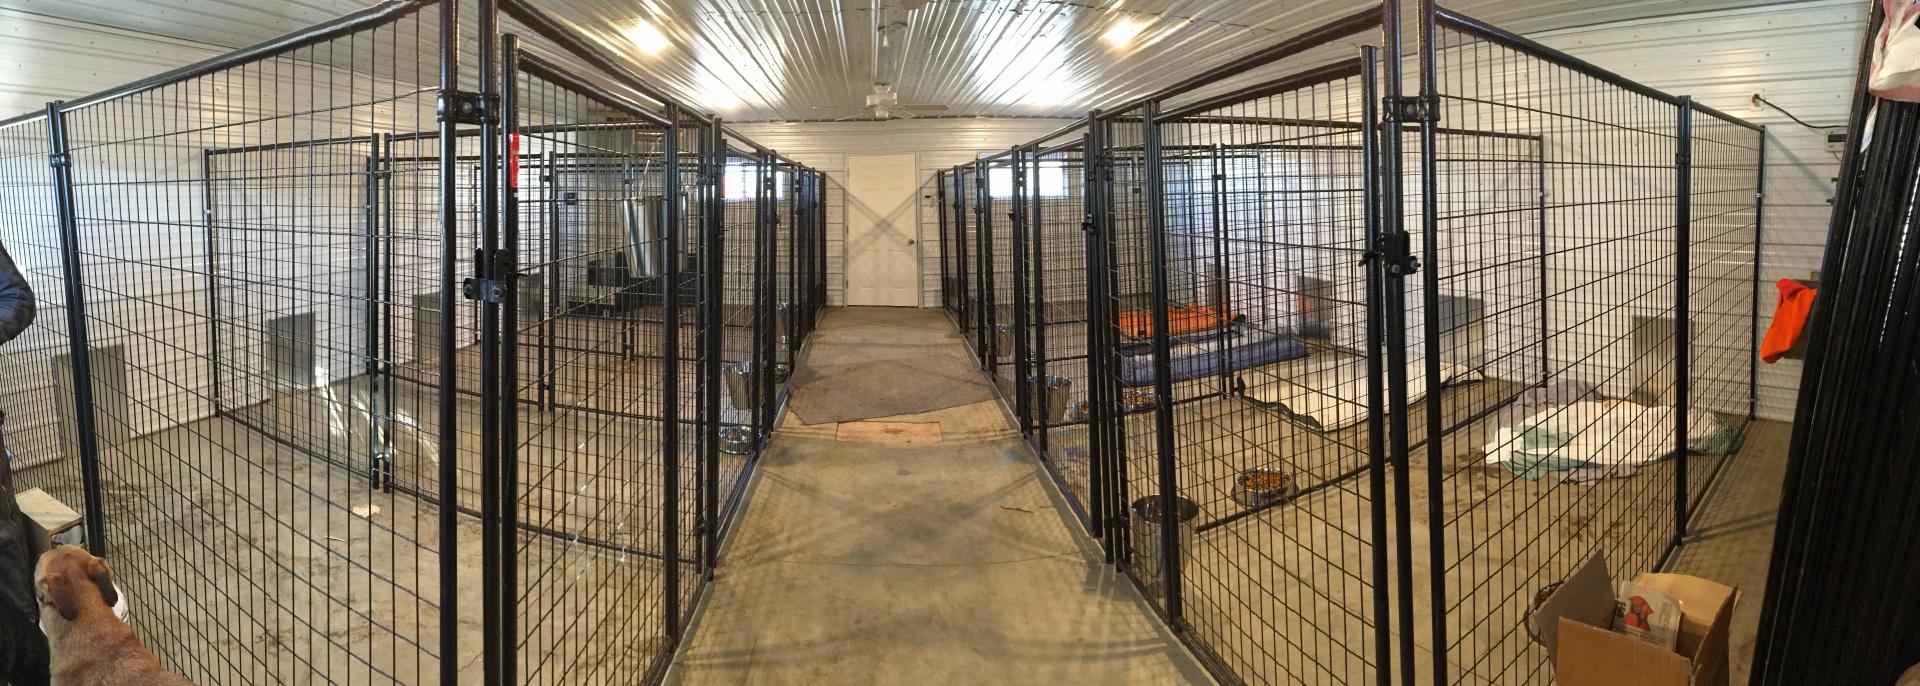 Dog Kennel North Dakota